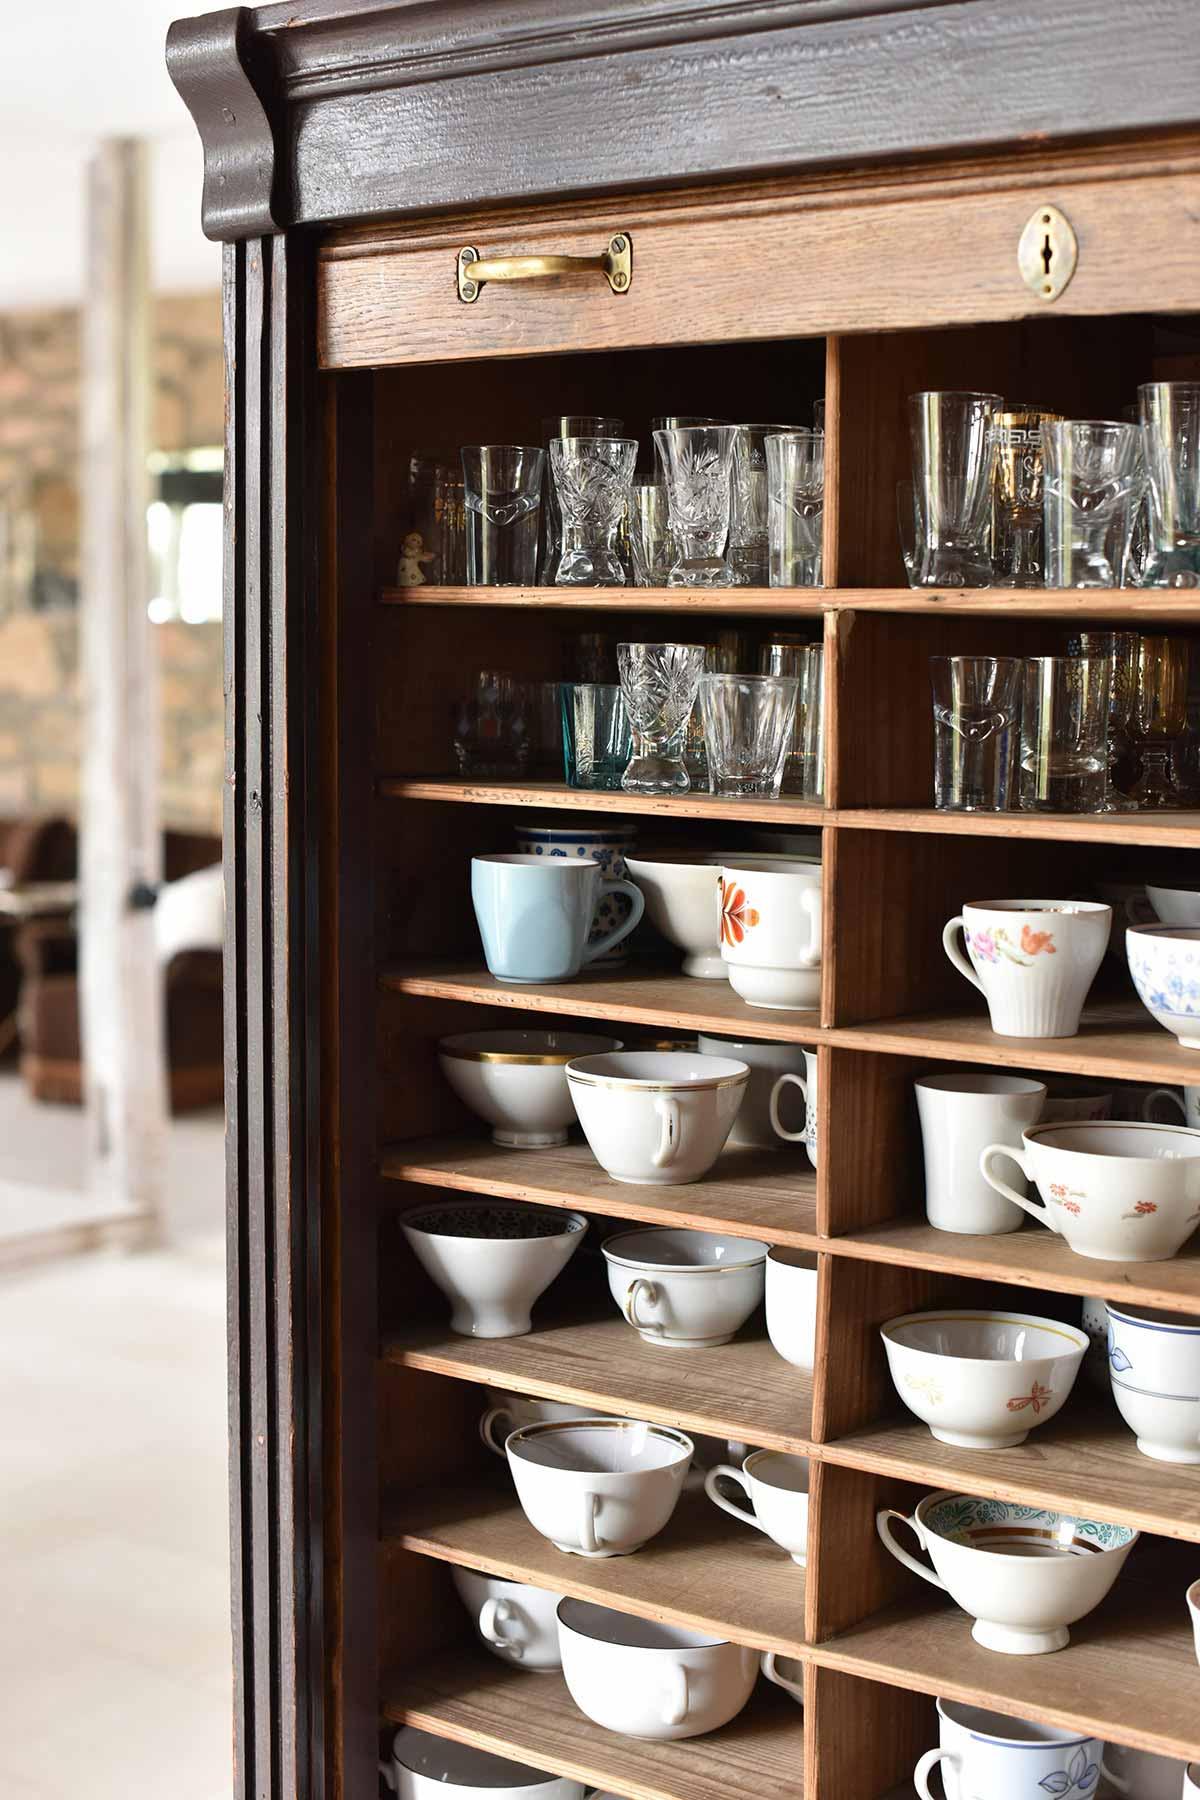 Filiżanki do herbaty w Polnej Zdrój